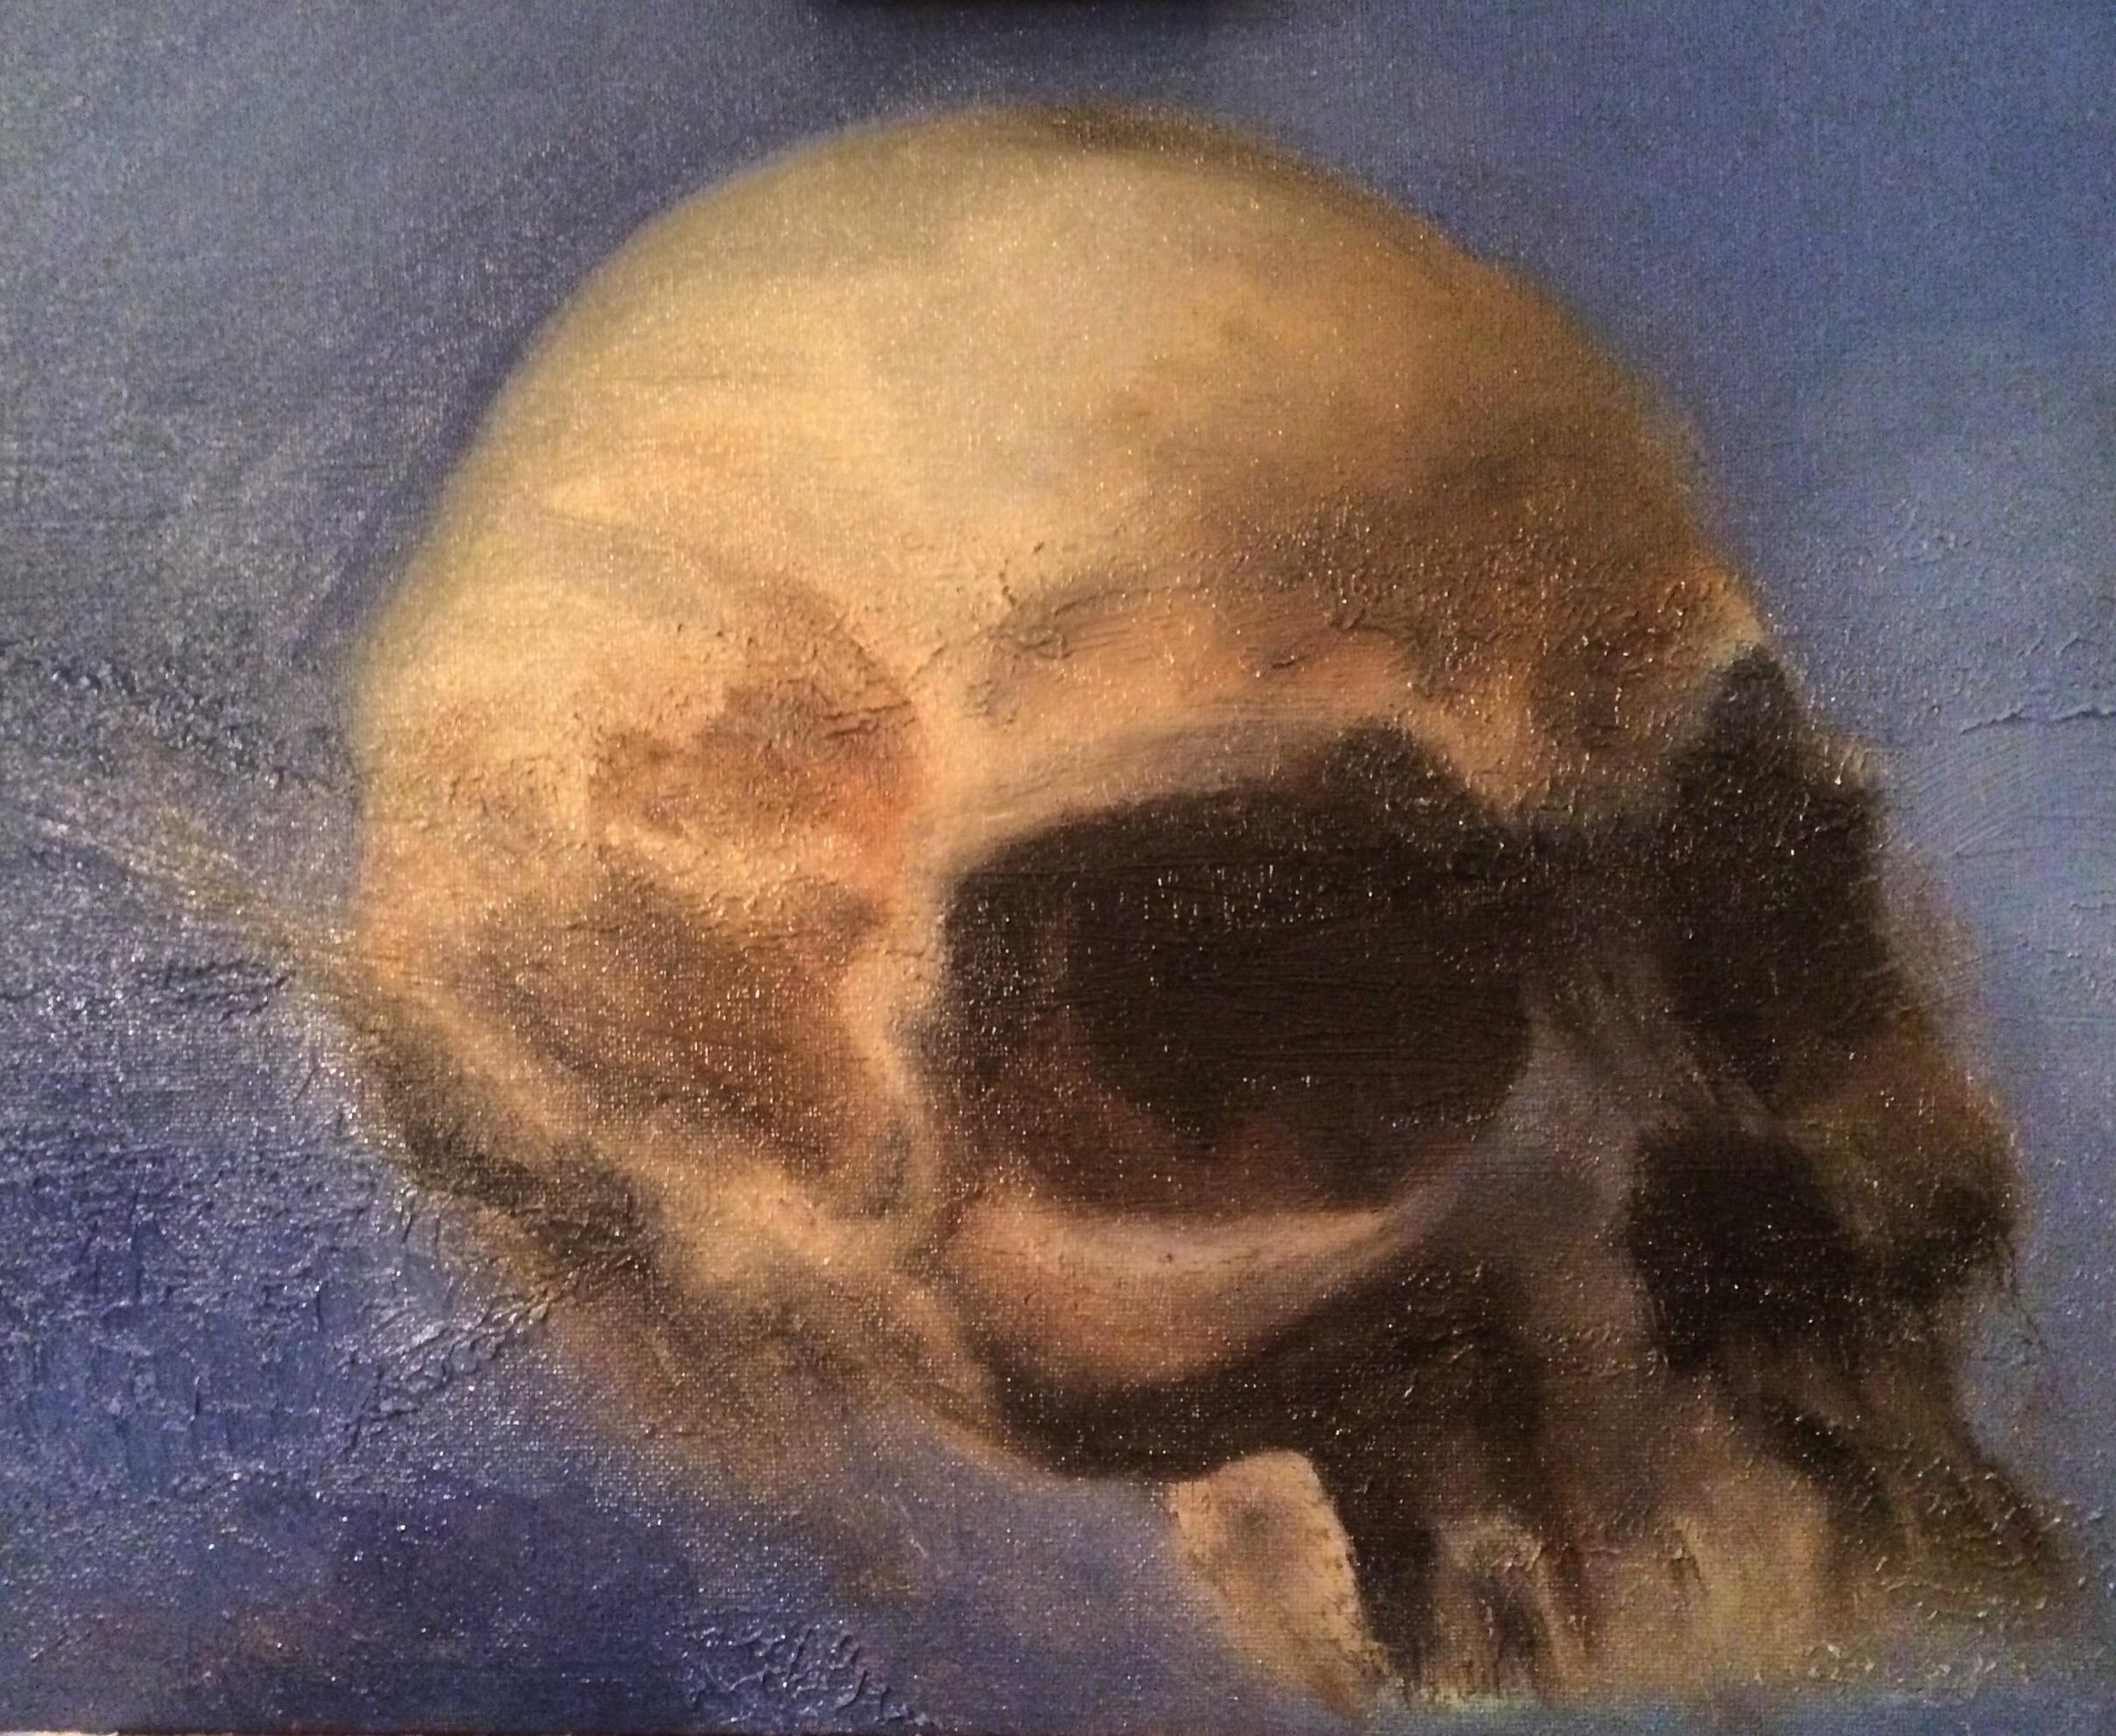 Study of Skull (Oil on Canvas 11x14)